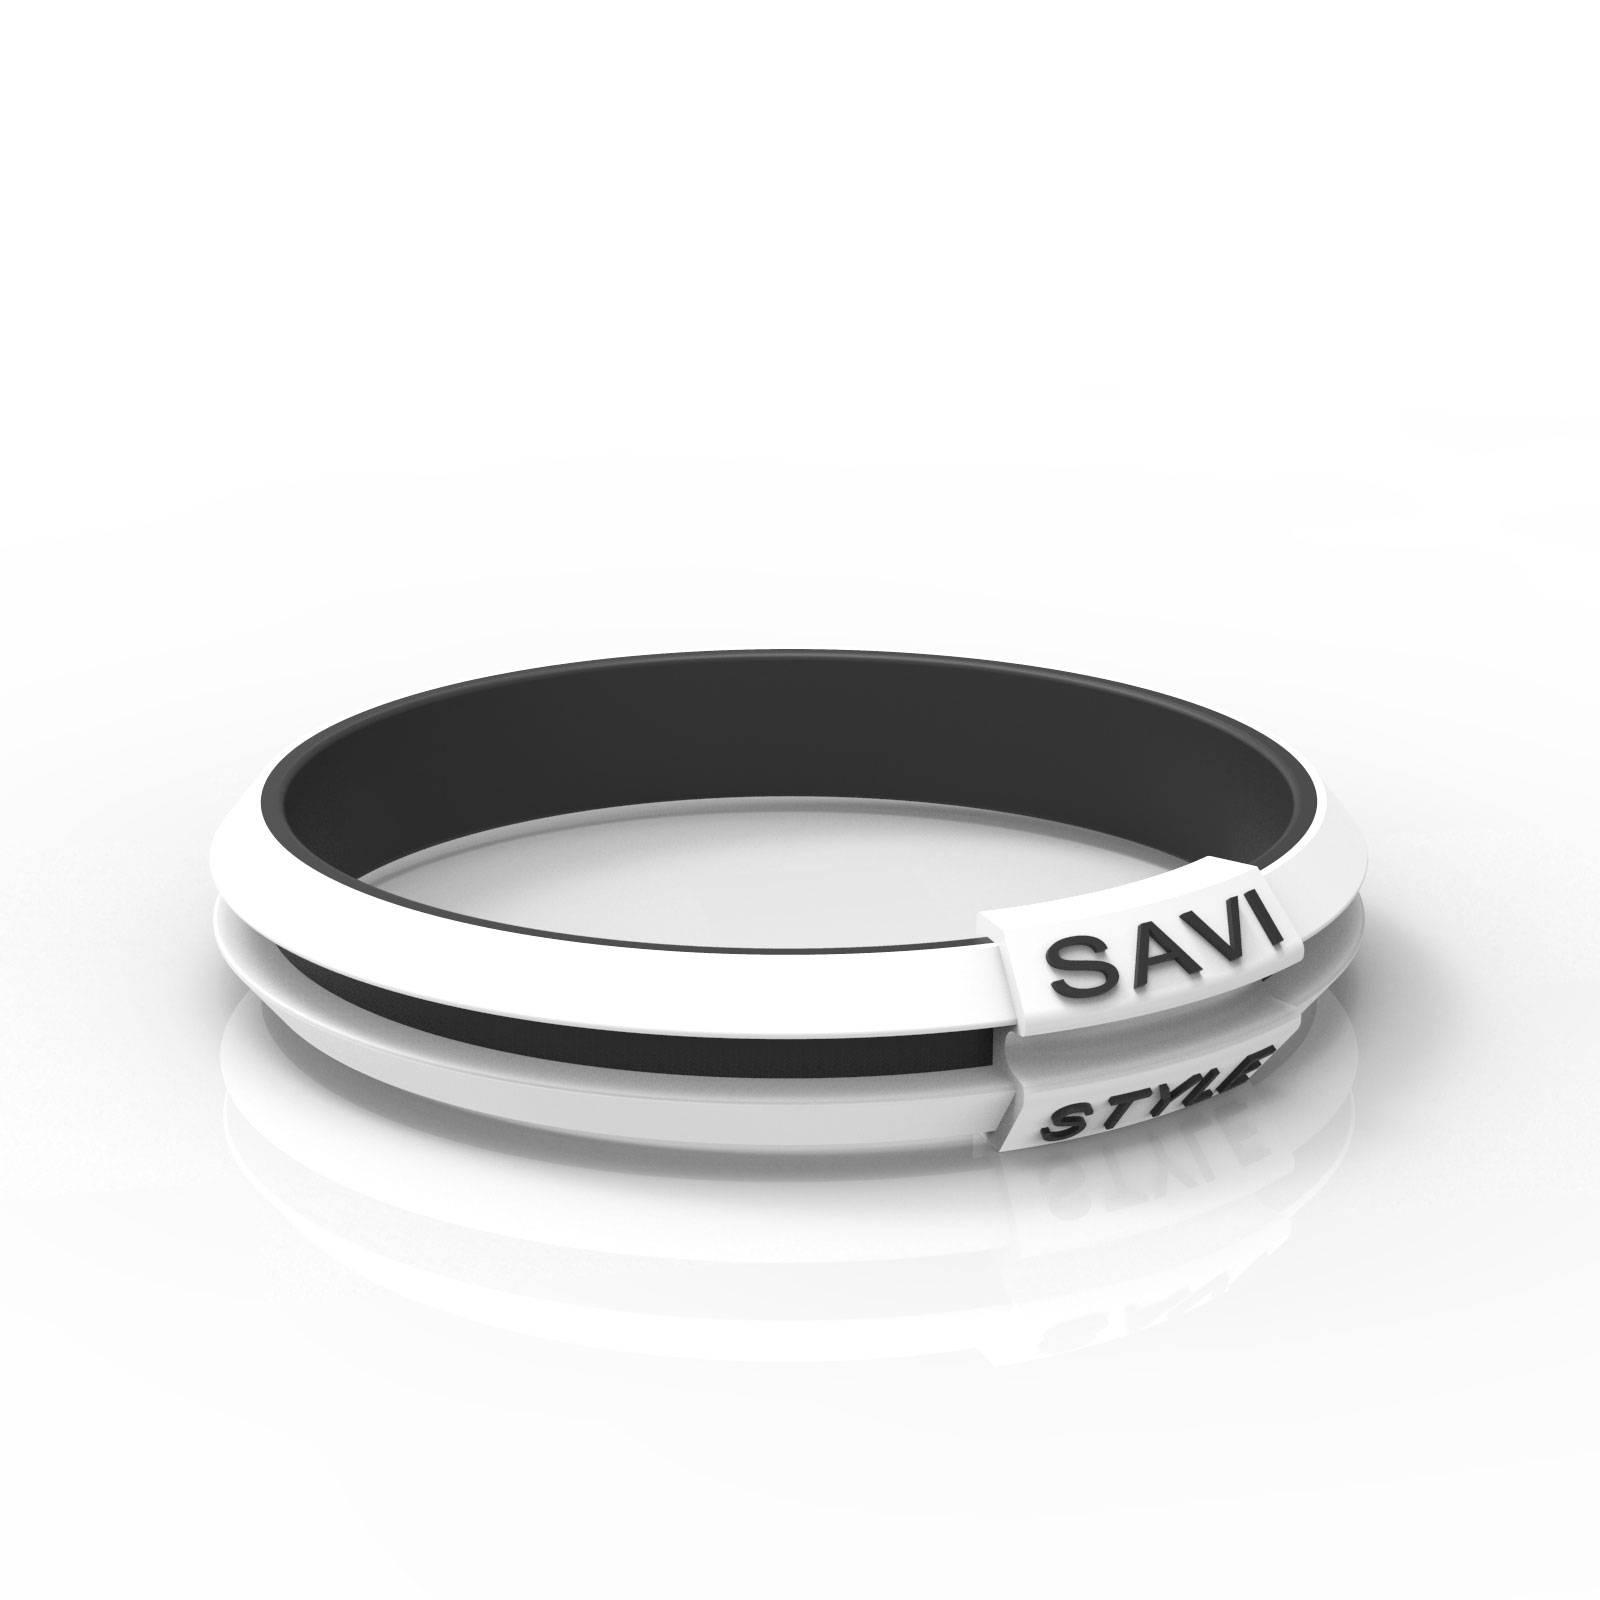 savi sleek brilliant white by savistle single view